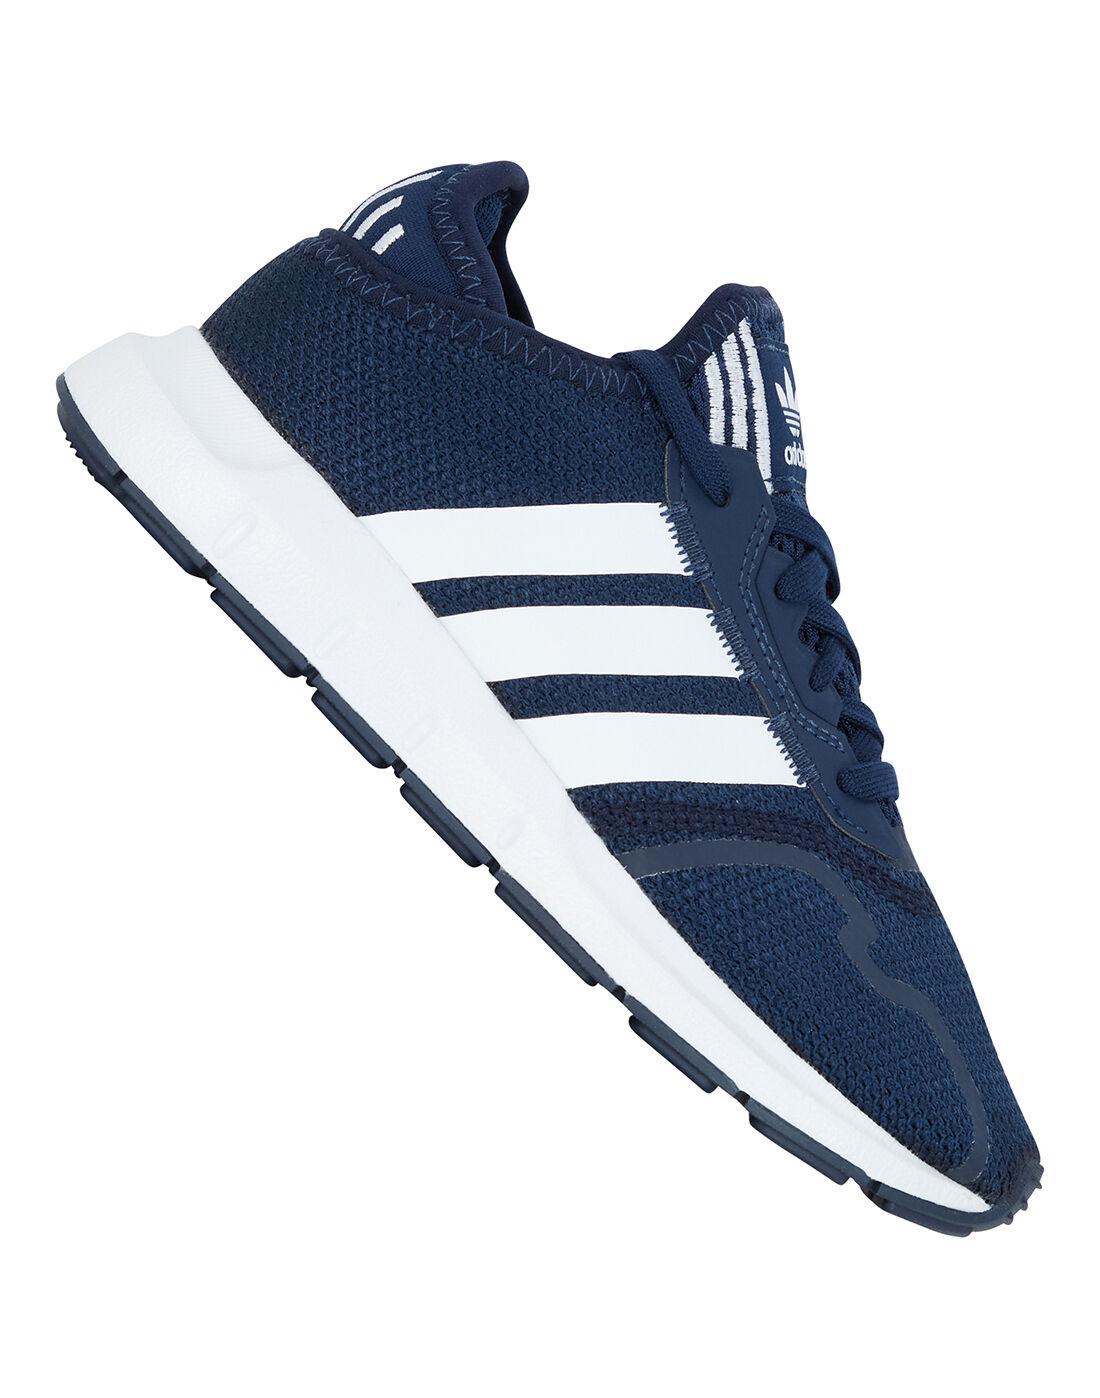 adidas Originals adidas dazzle pants girls black shoes size 13 | Younger Kids Swift Run